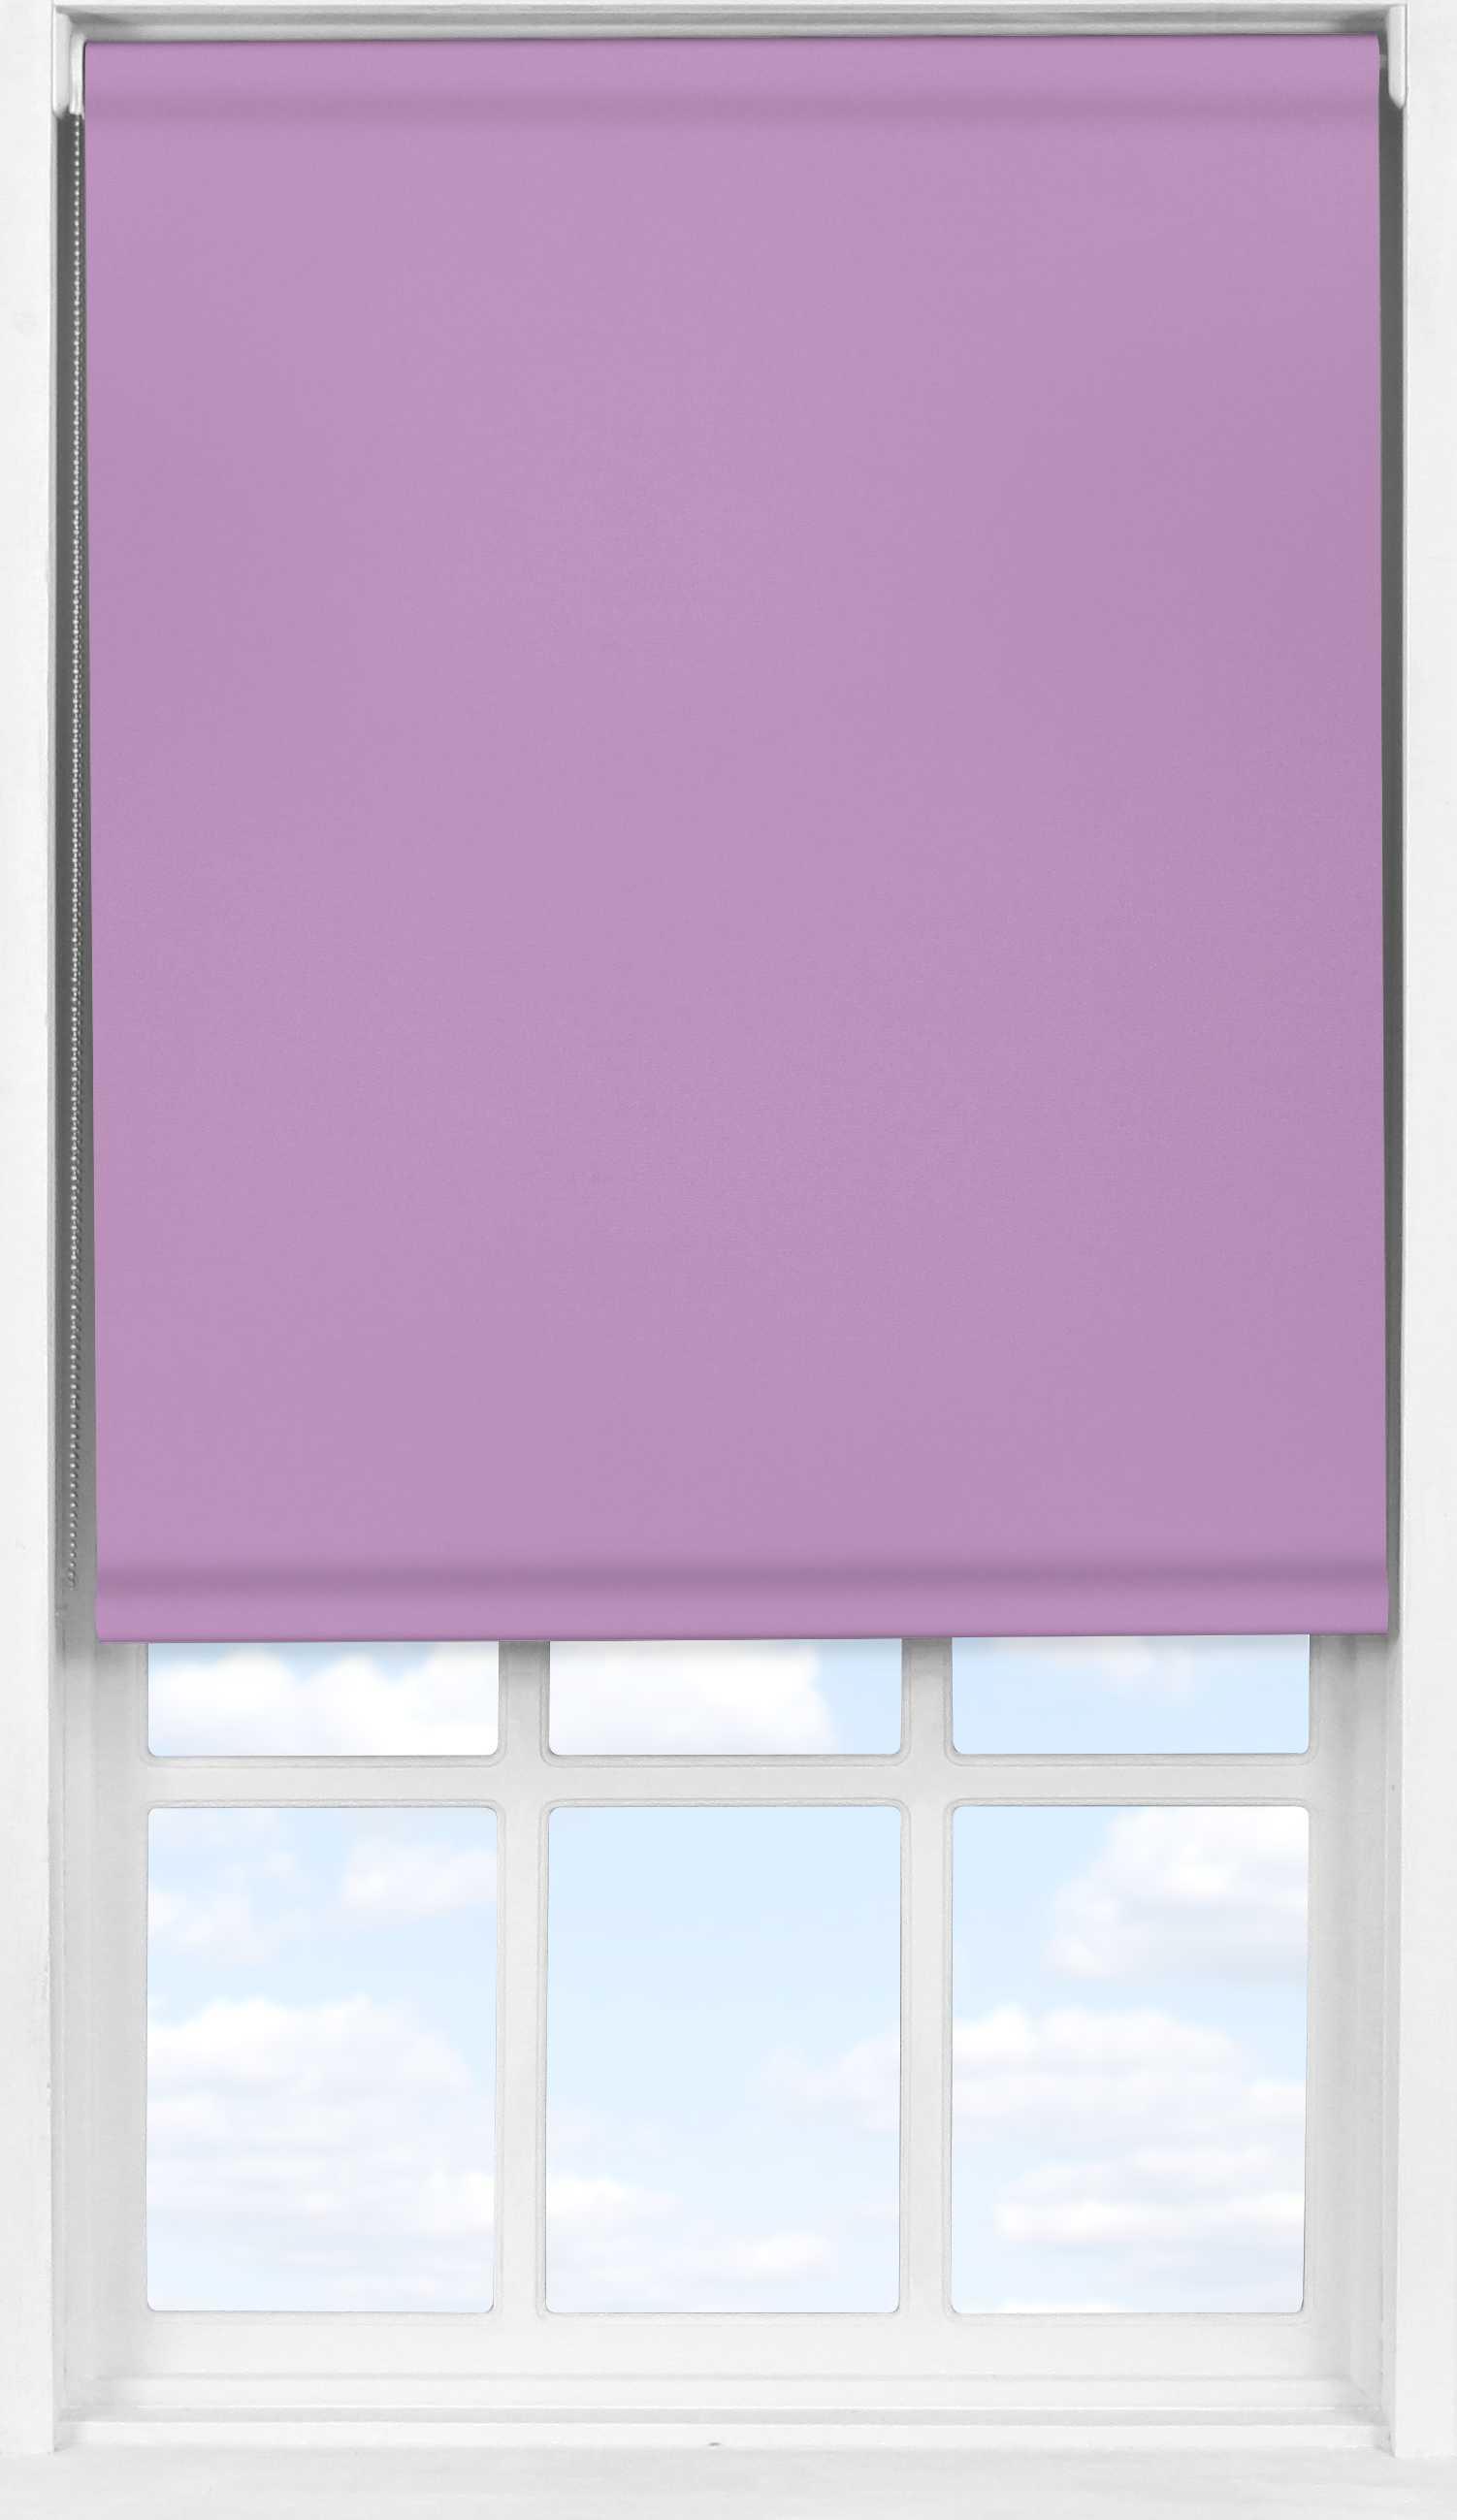 Easifit Roller Blind in Foxglove Translucent